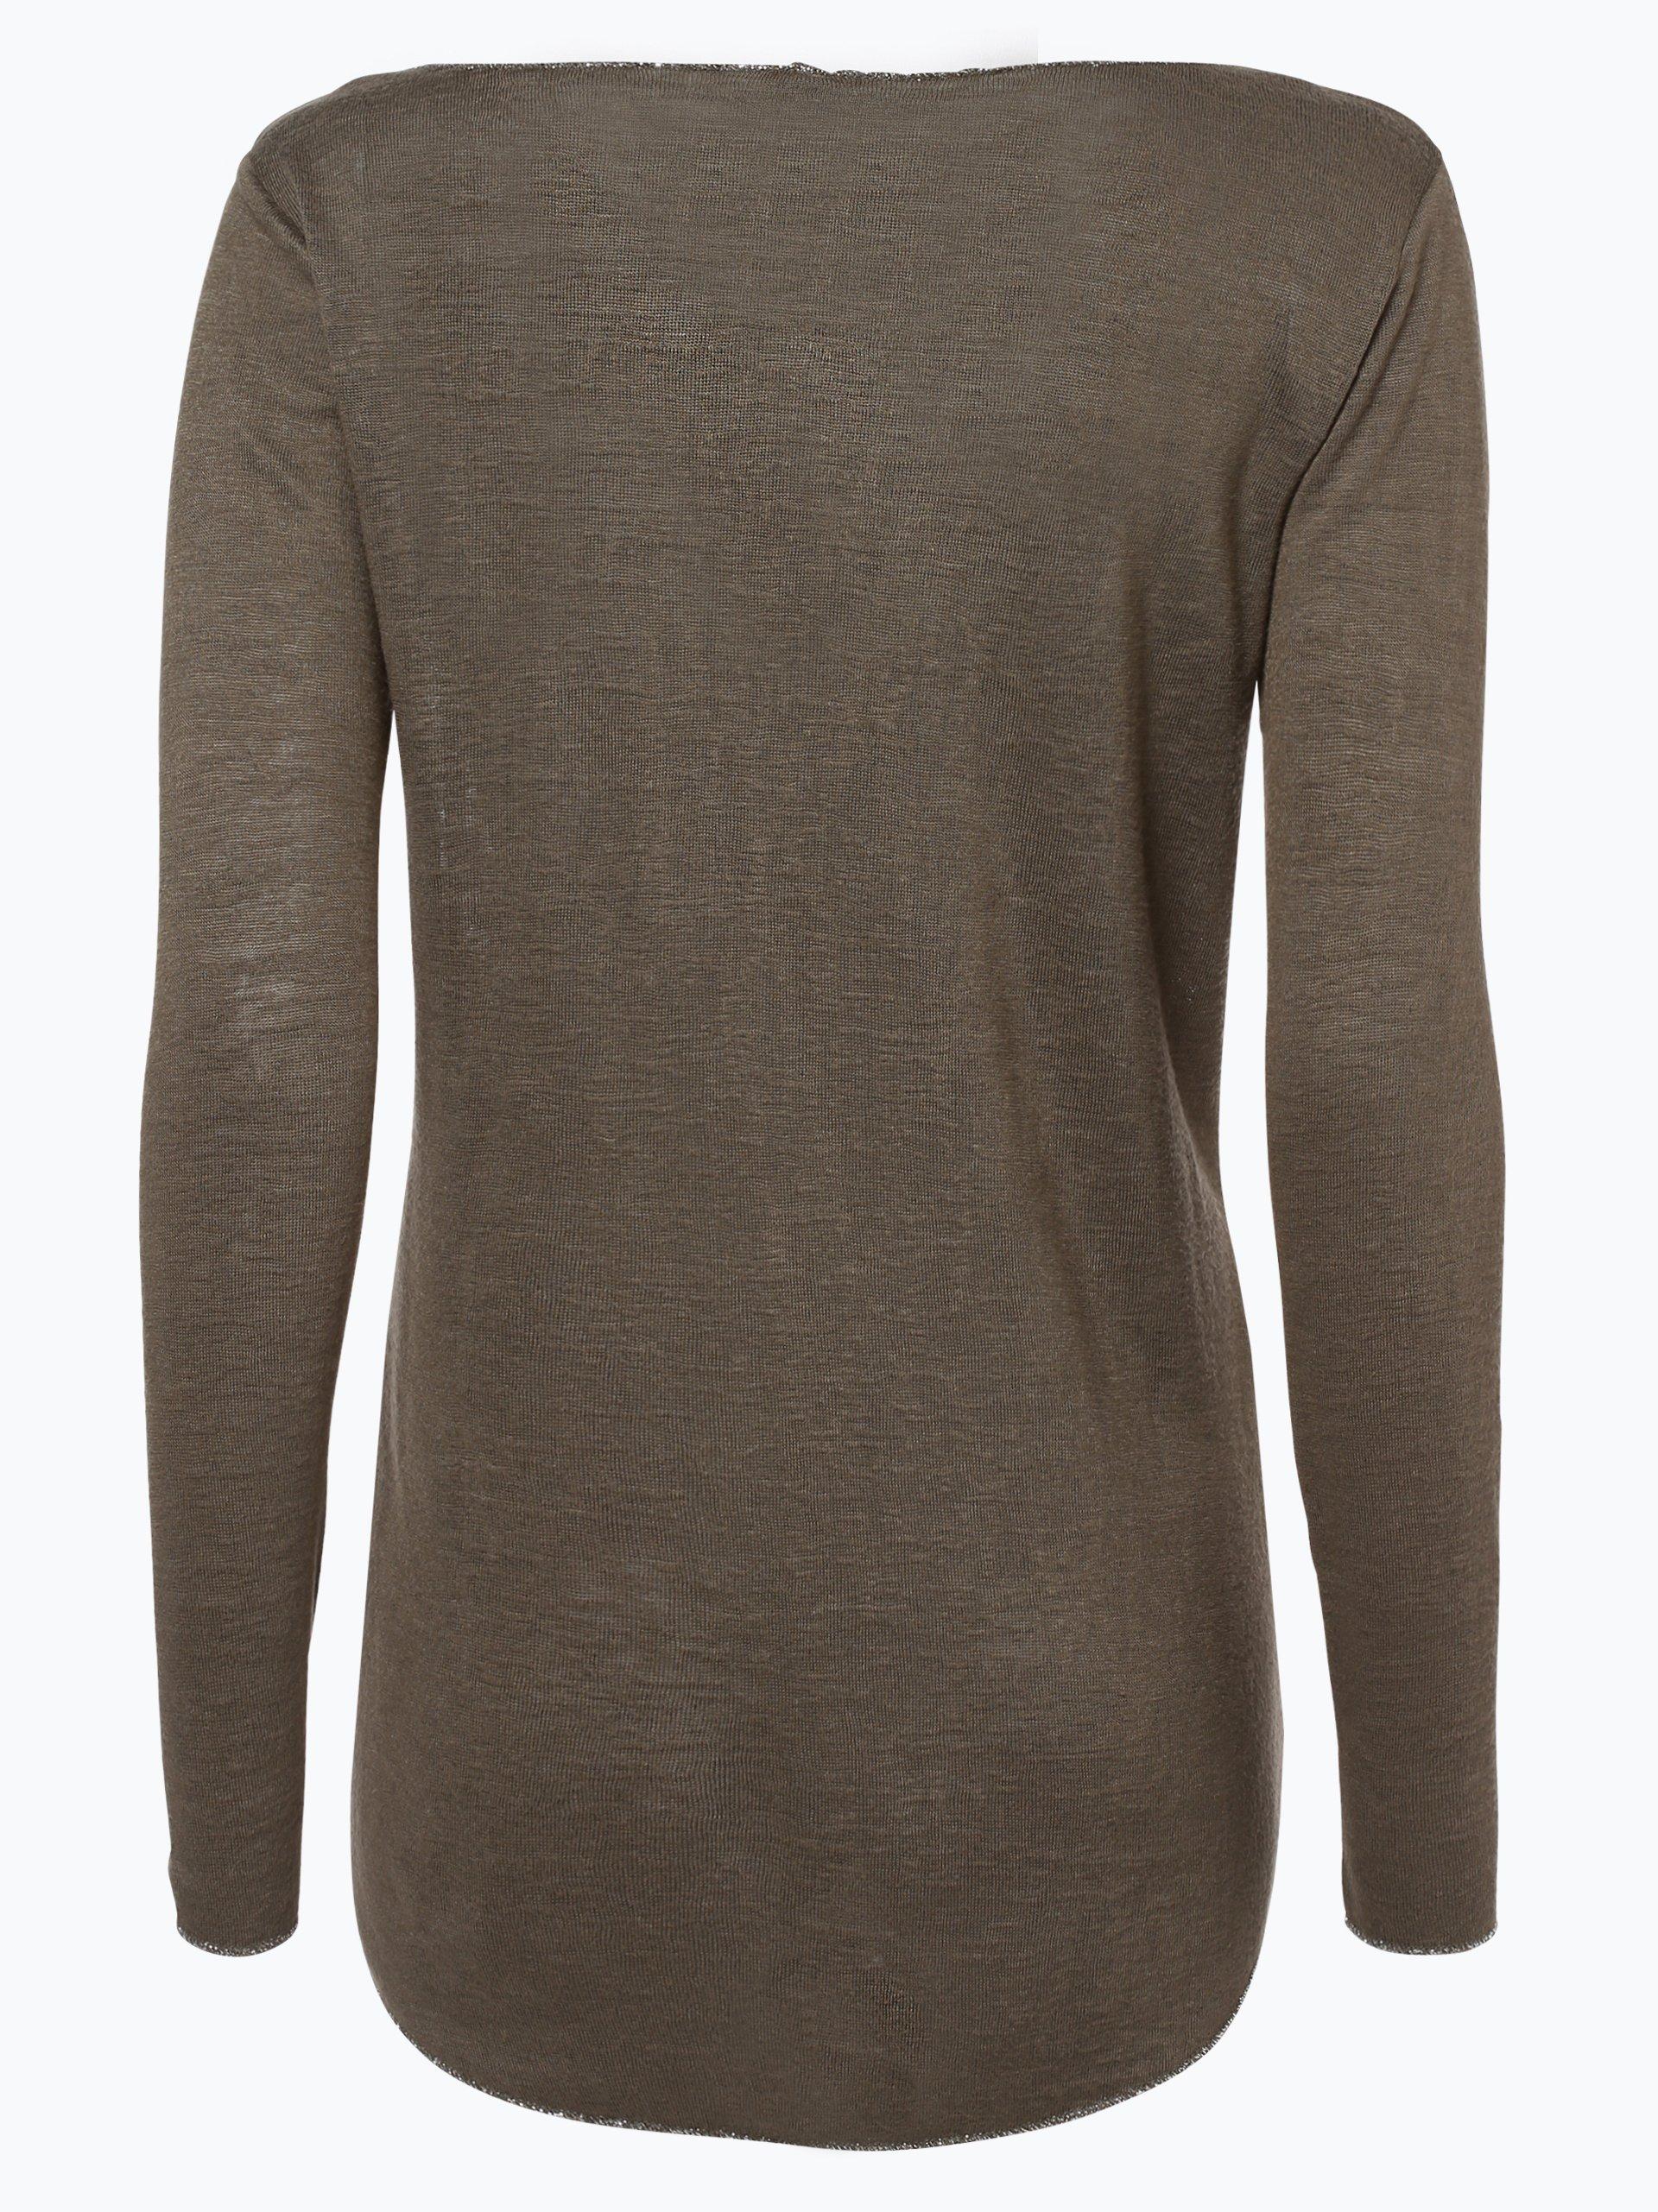 key largo damen langarmshirt emilia oliv gemustert online kaufen peek und cloppenburg de. Black Bedroom Furniture Sets. Home Design Ideas